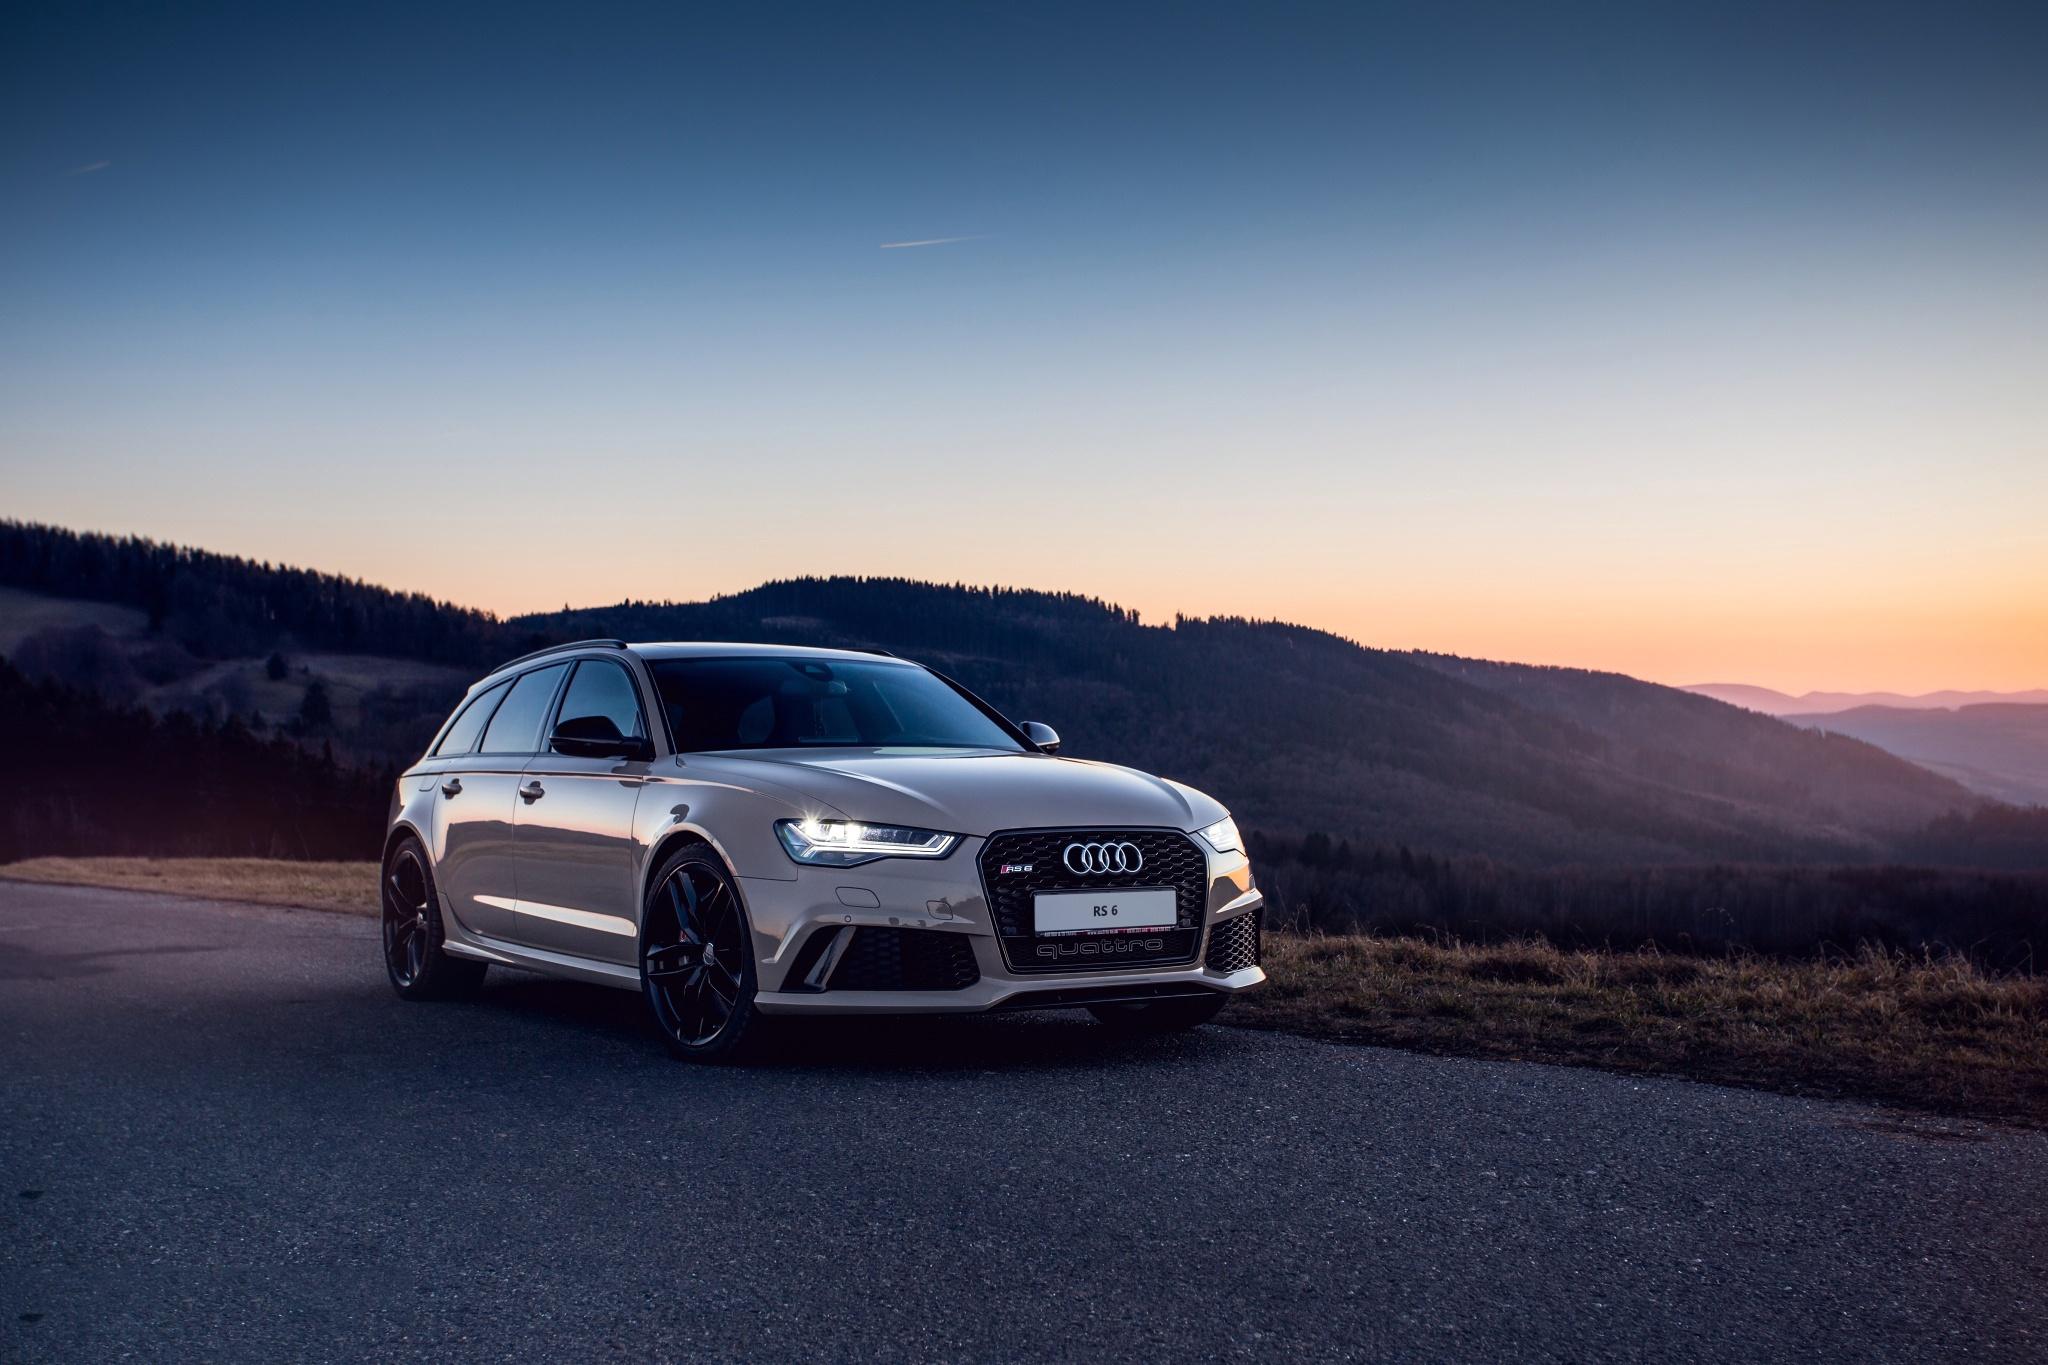 Audi avant обои на рабочий стол